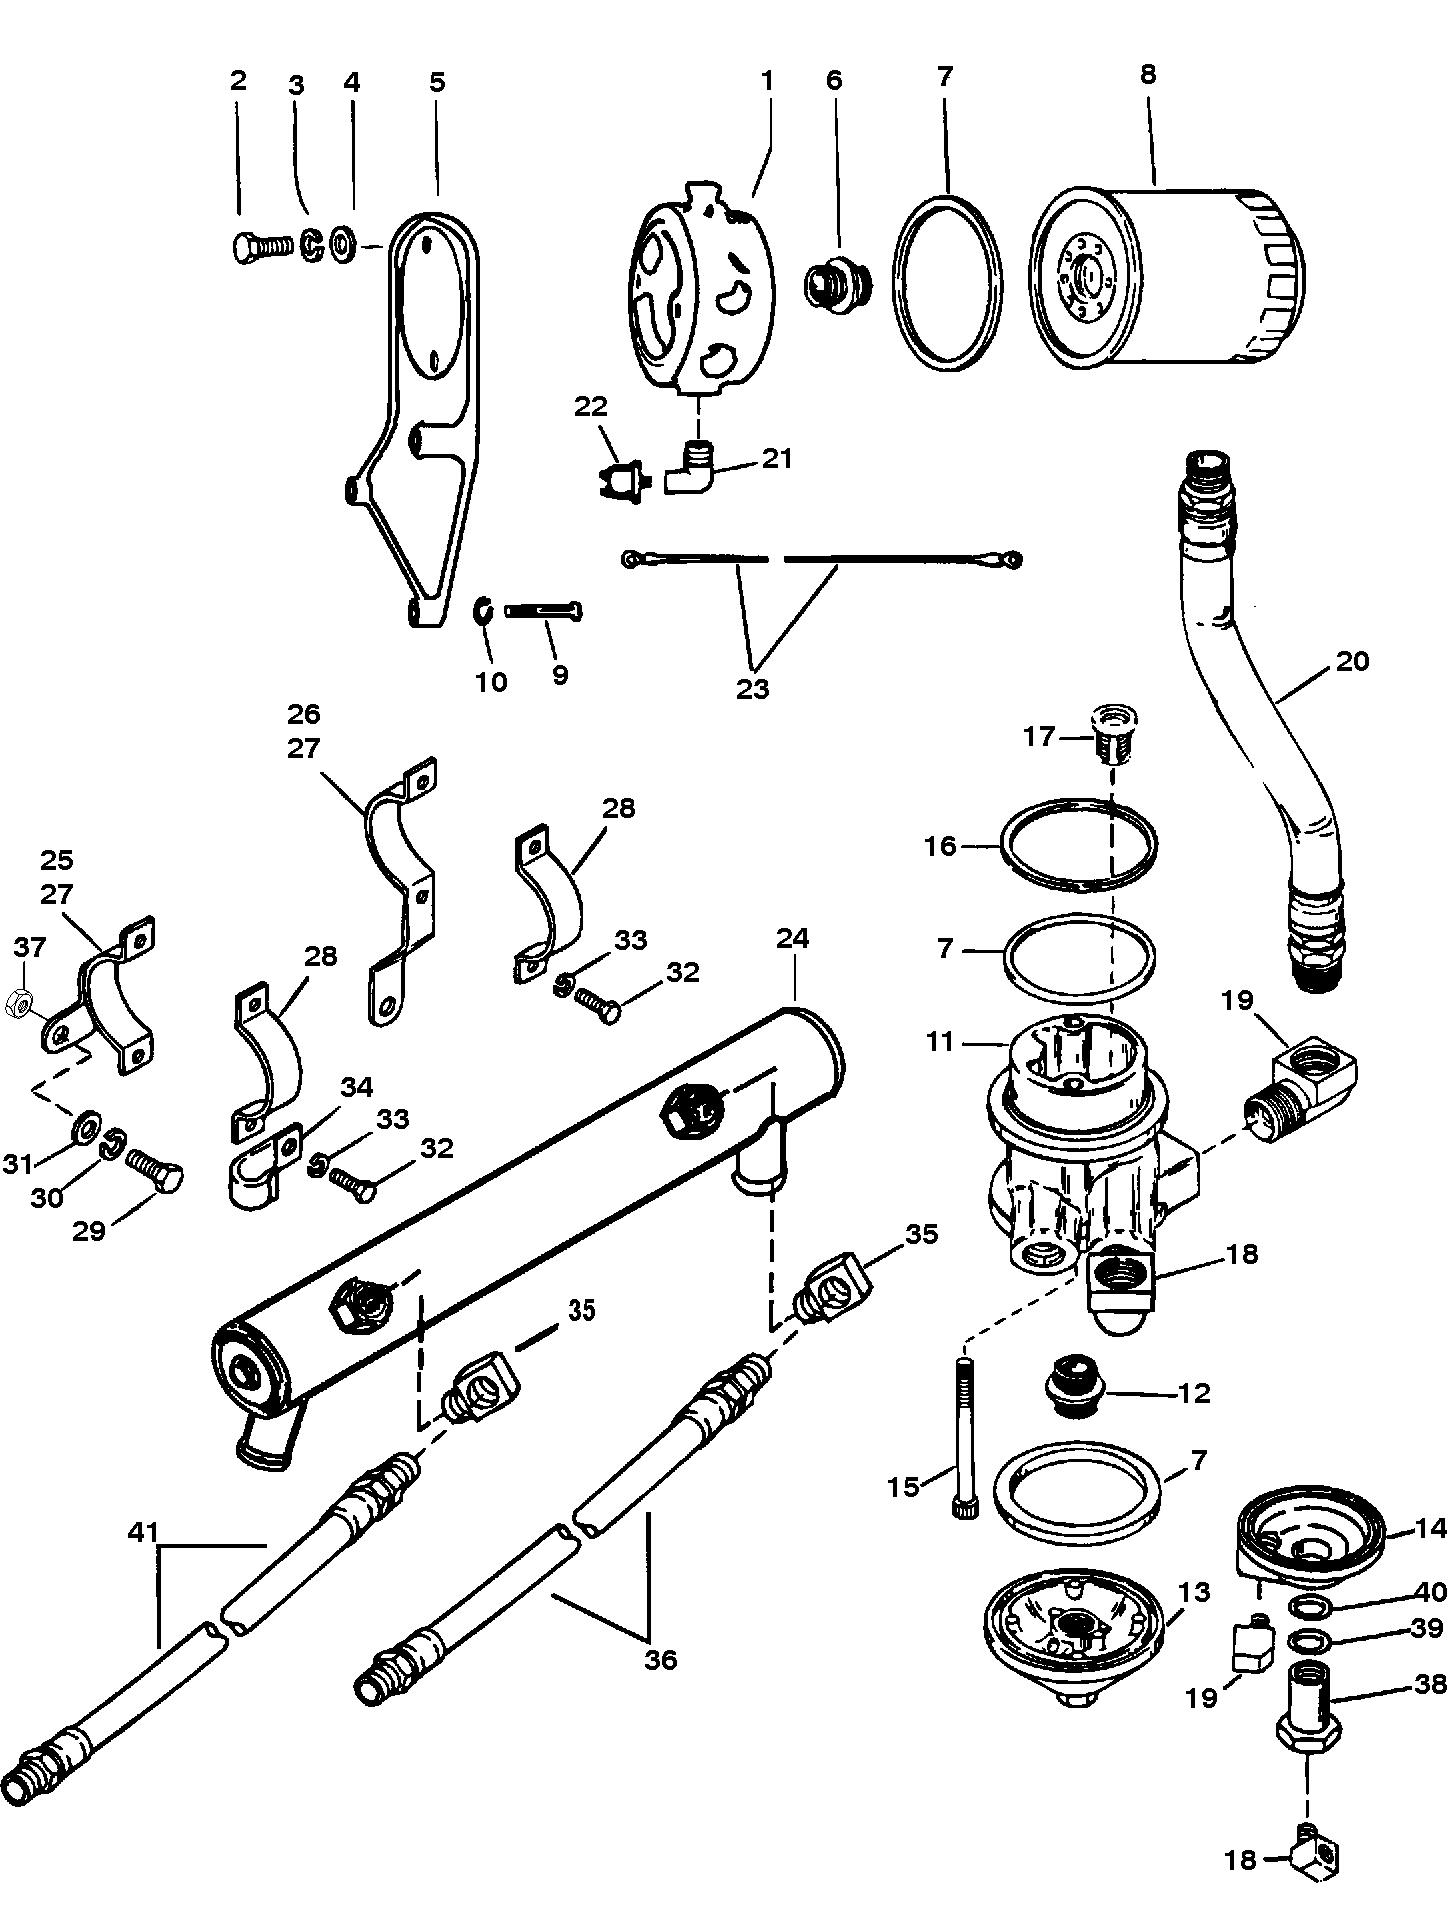 Up A Gm Alternator Wiring - Wiring Diagrams Dock